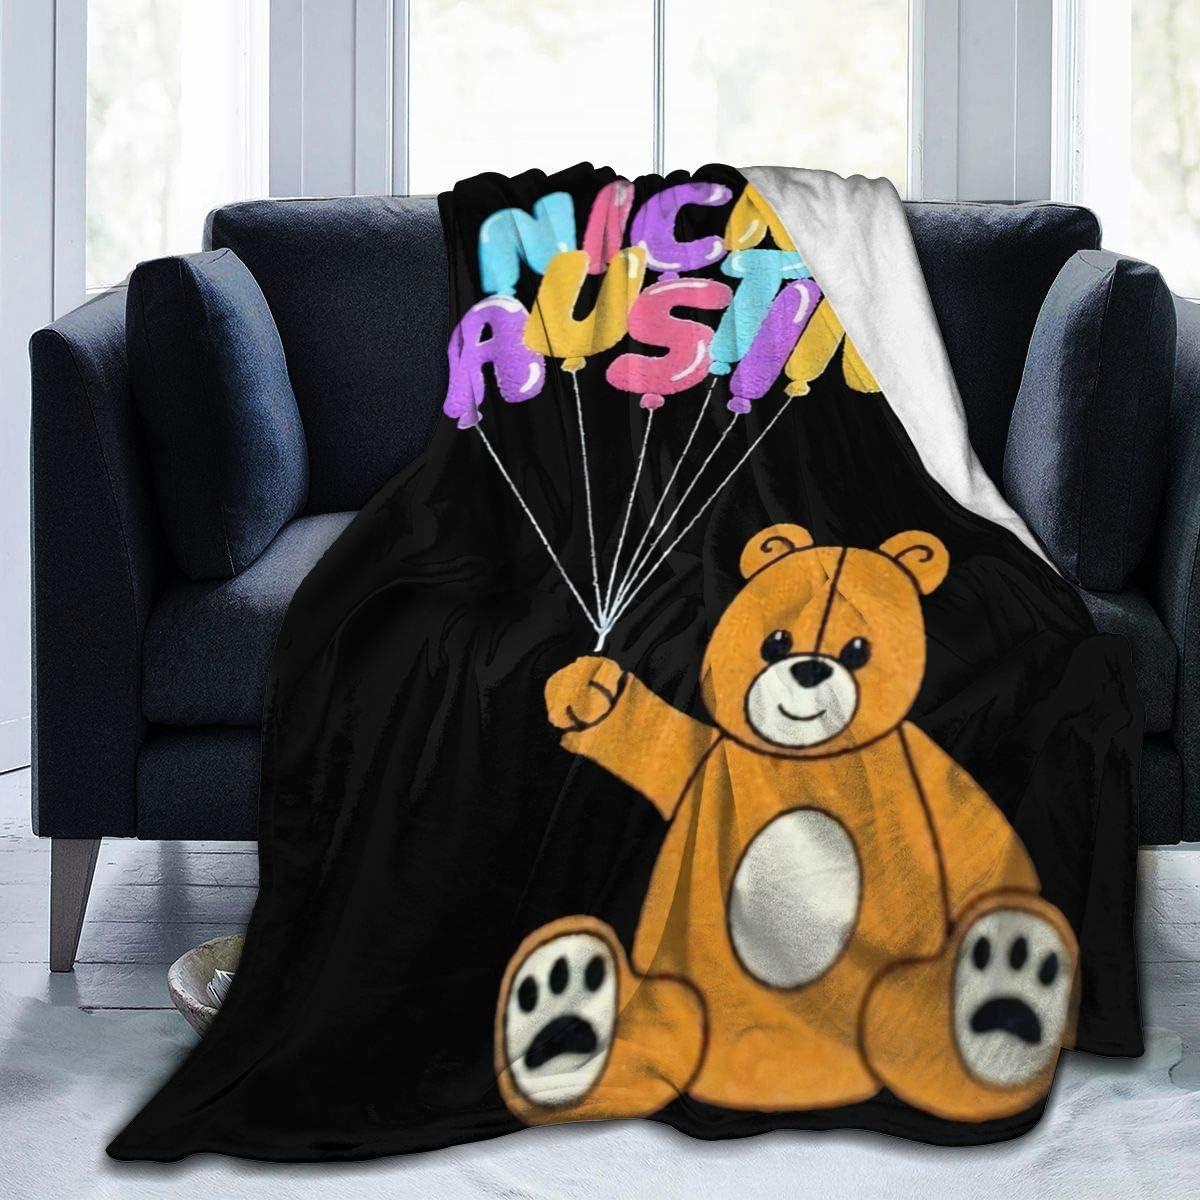 DouglassJWashington Nick Austin Bear Blanket F 受注生産品 Microfiber Fleece 豊富な品